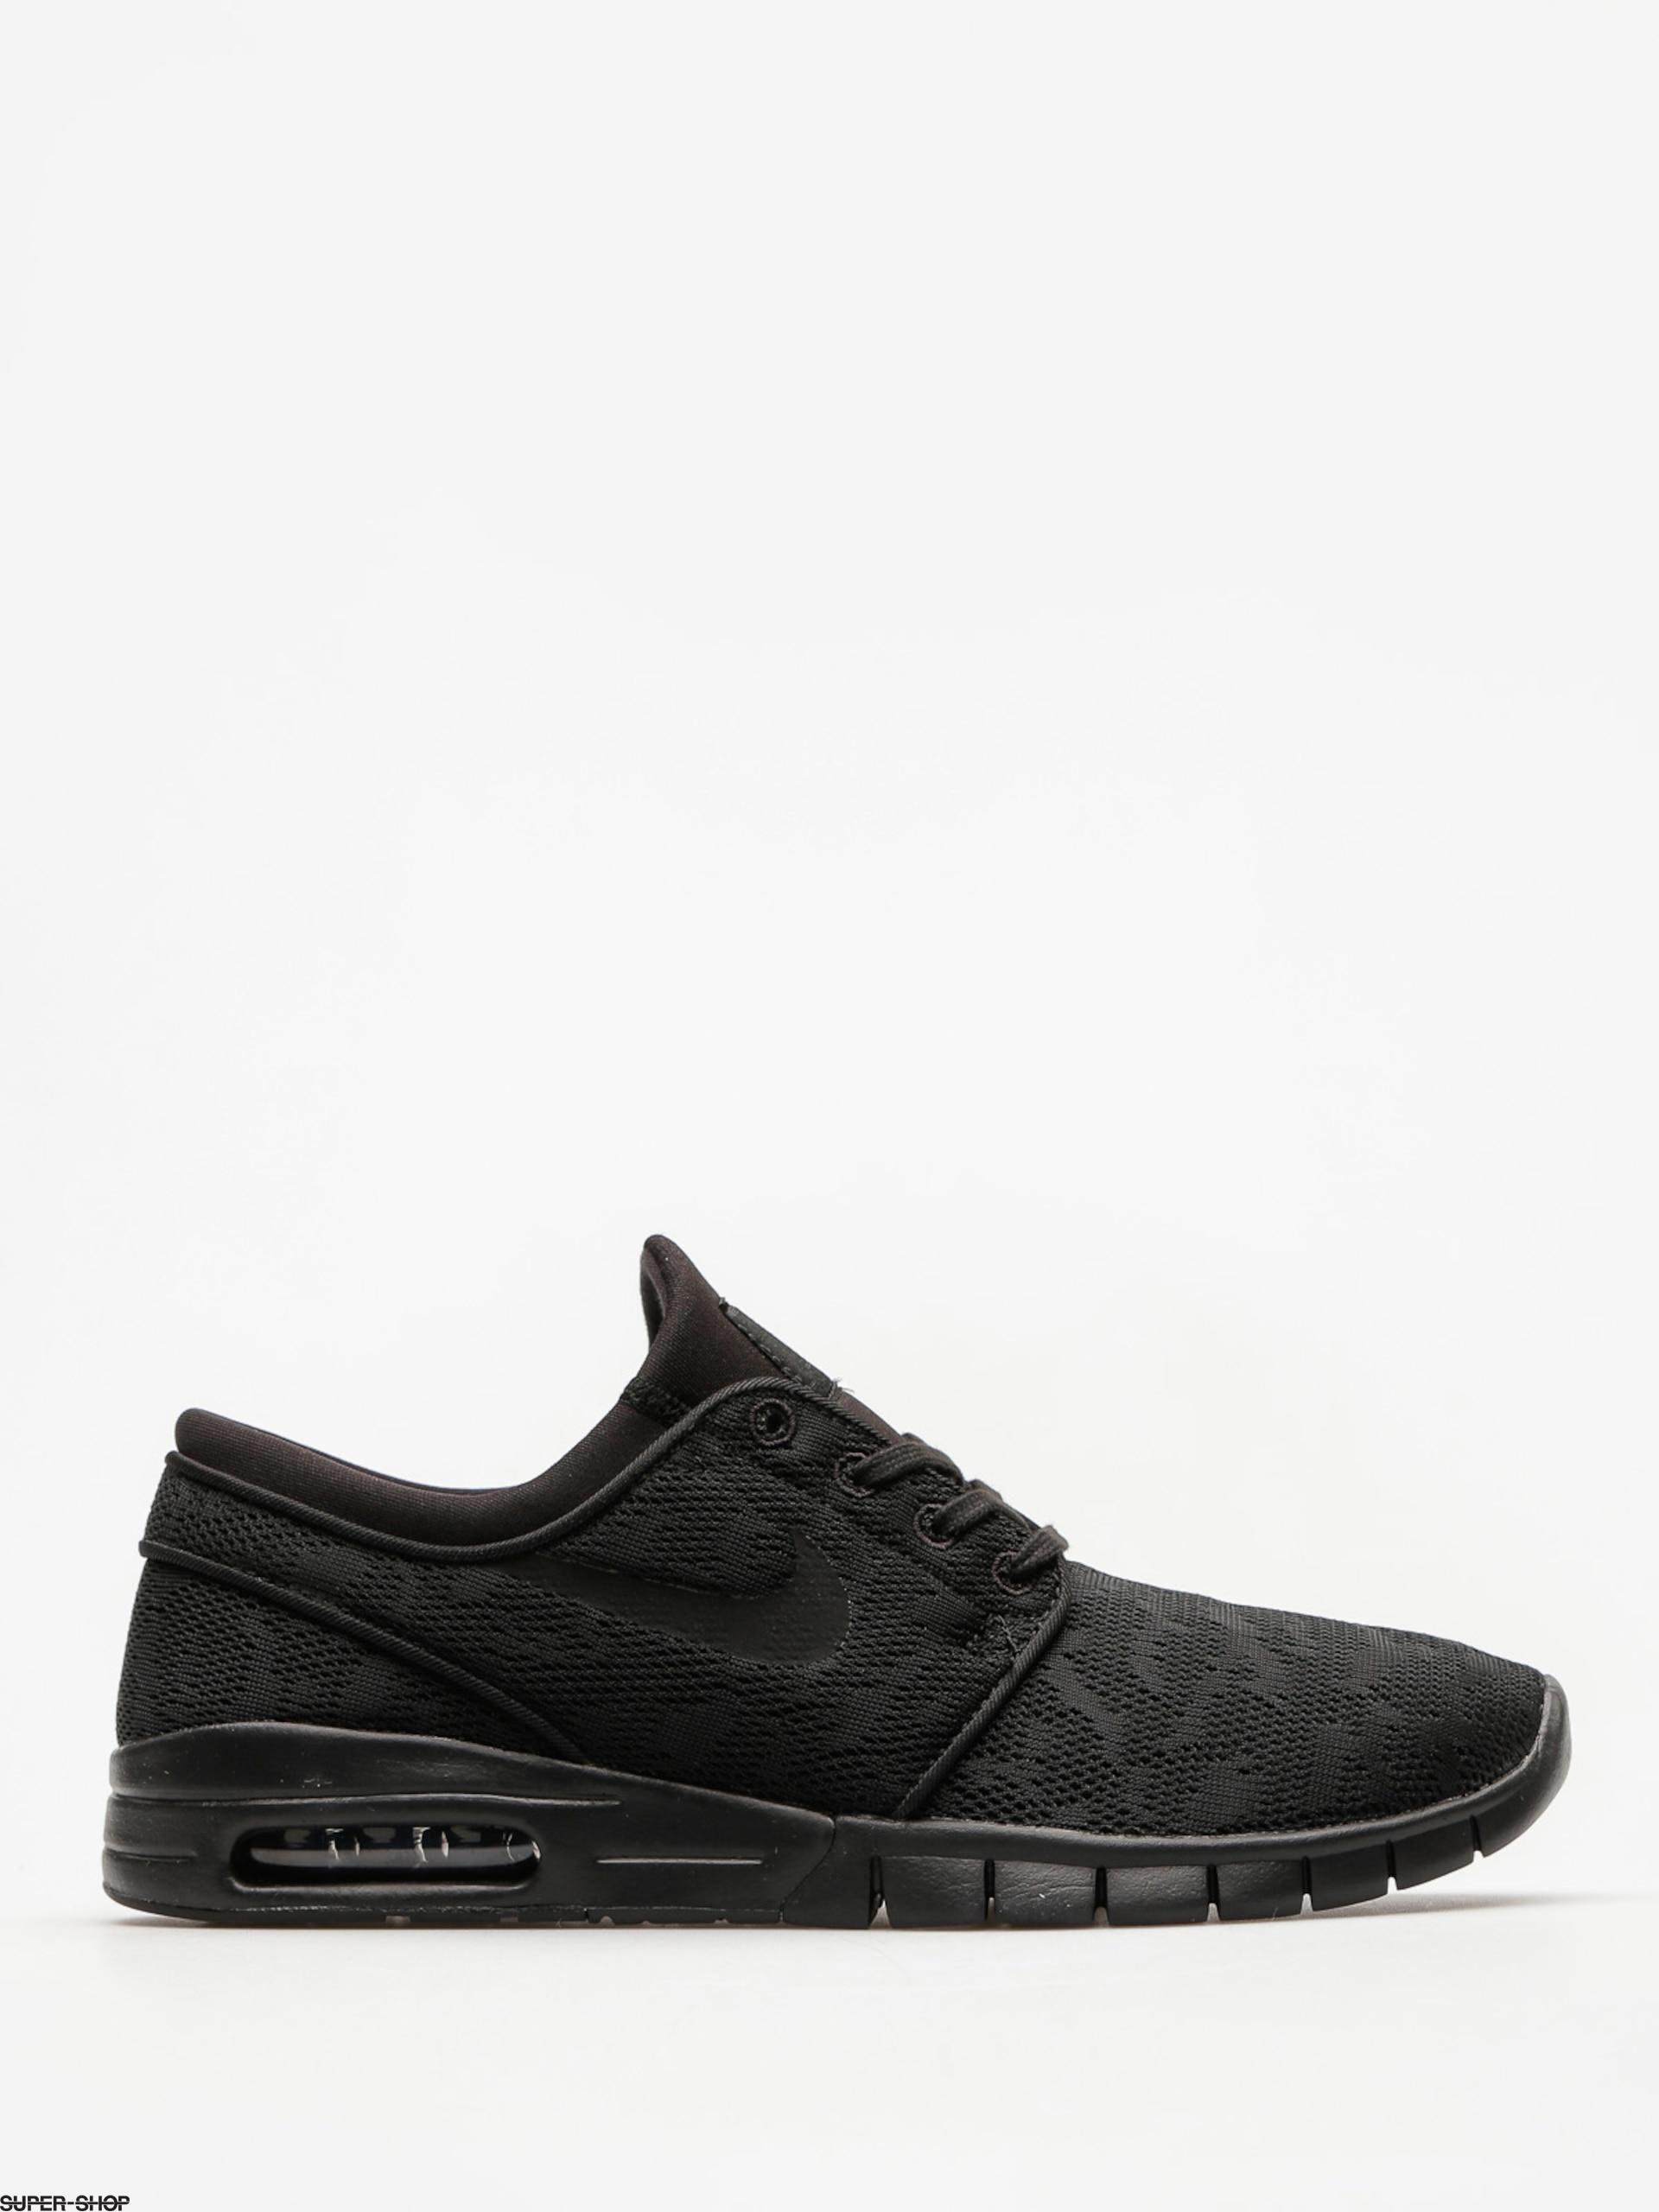 296cb368012e 909836-w1920-nike-sb-shoes-sb-stefan-janoski-max-black-black-anthracite.jpg